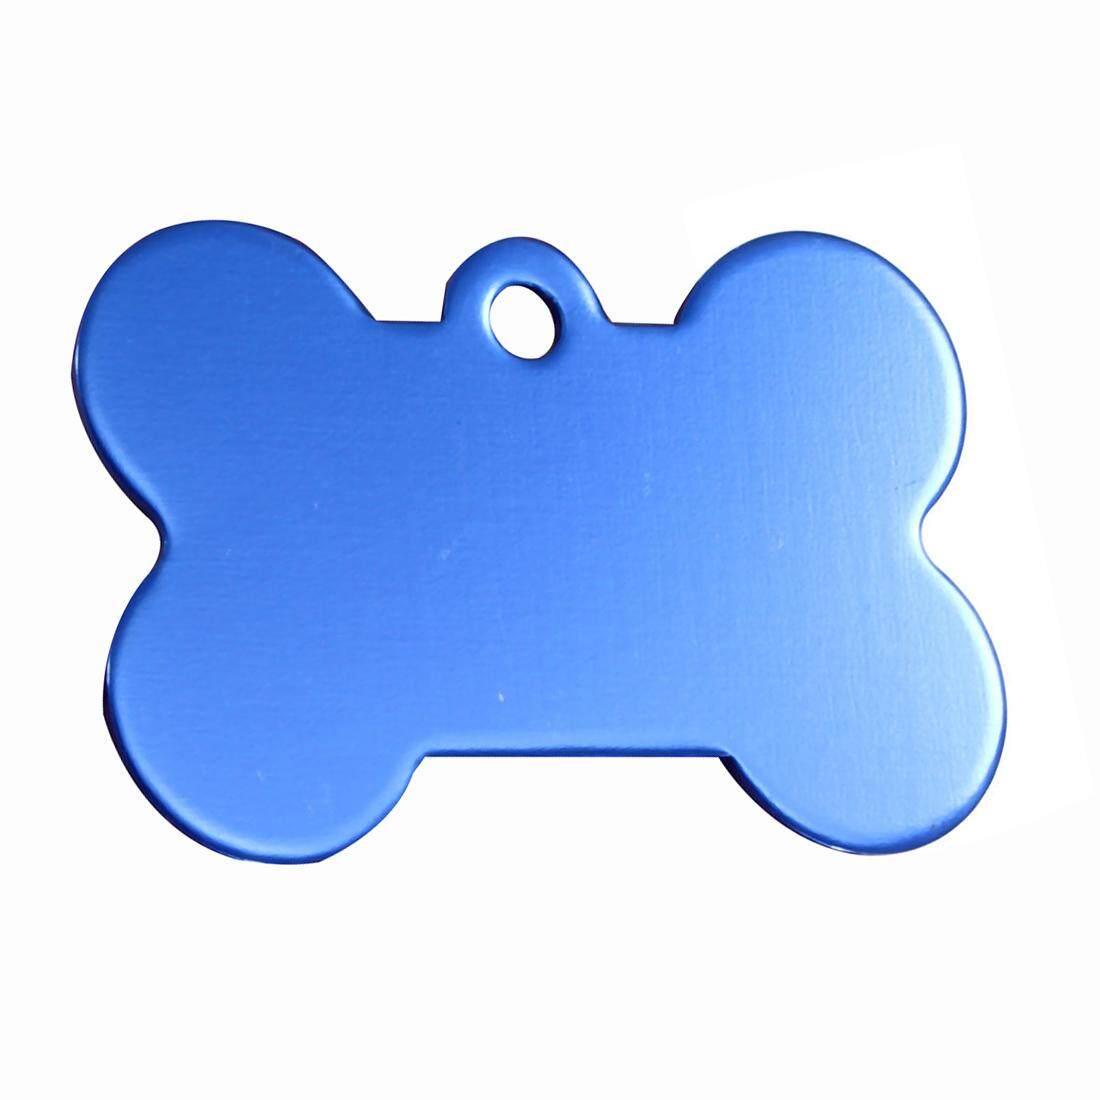 collar id tags buy collar id tags at best price in malaysia www